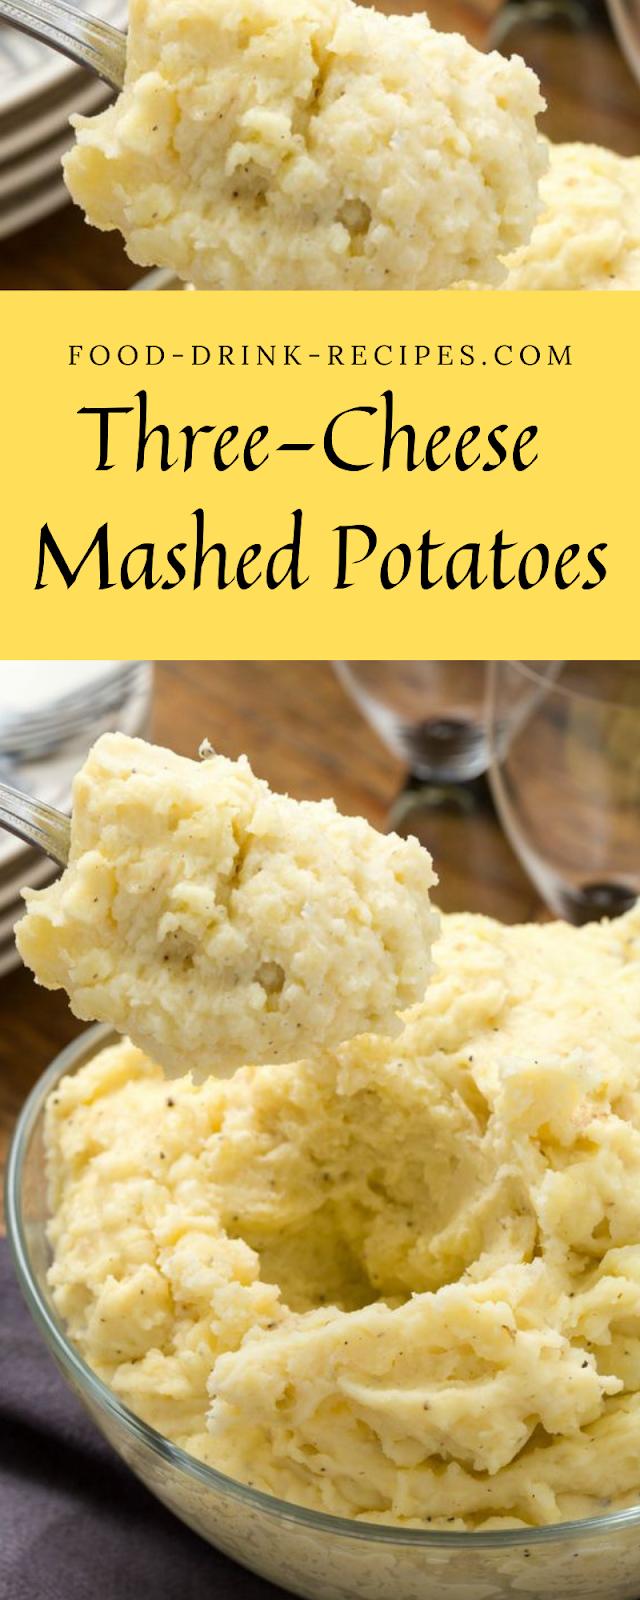 Three-Cheese Mashed Potatoes - food-drink-recipes.com